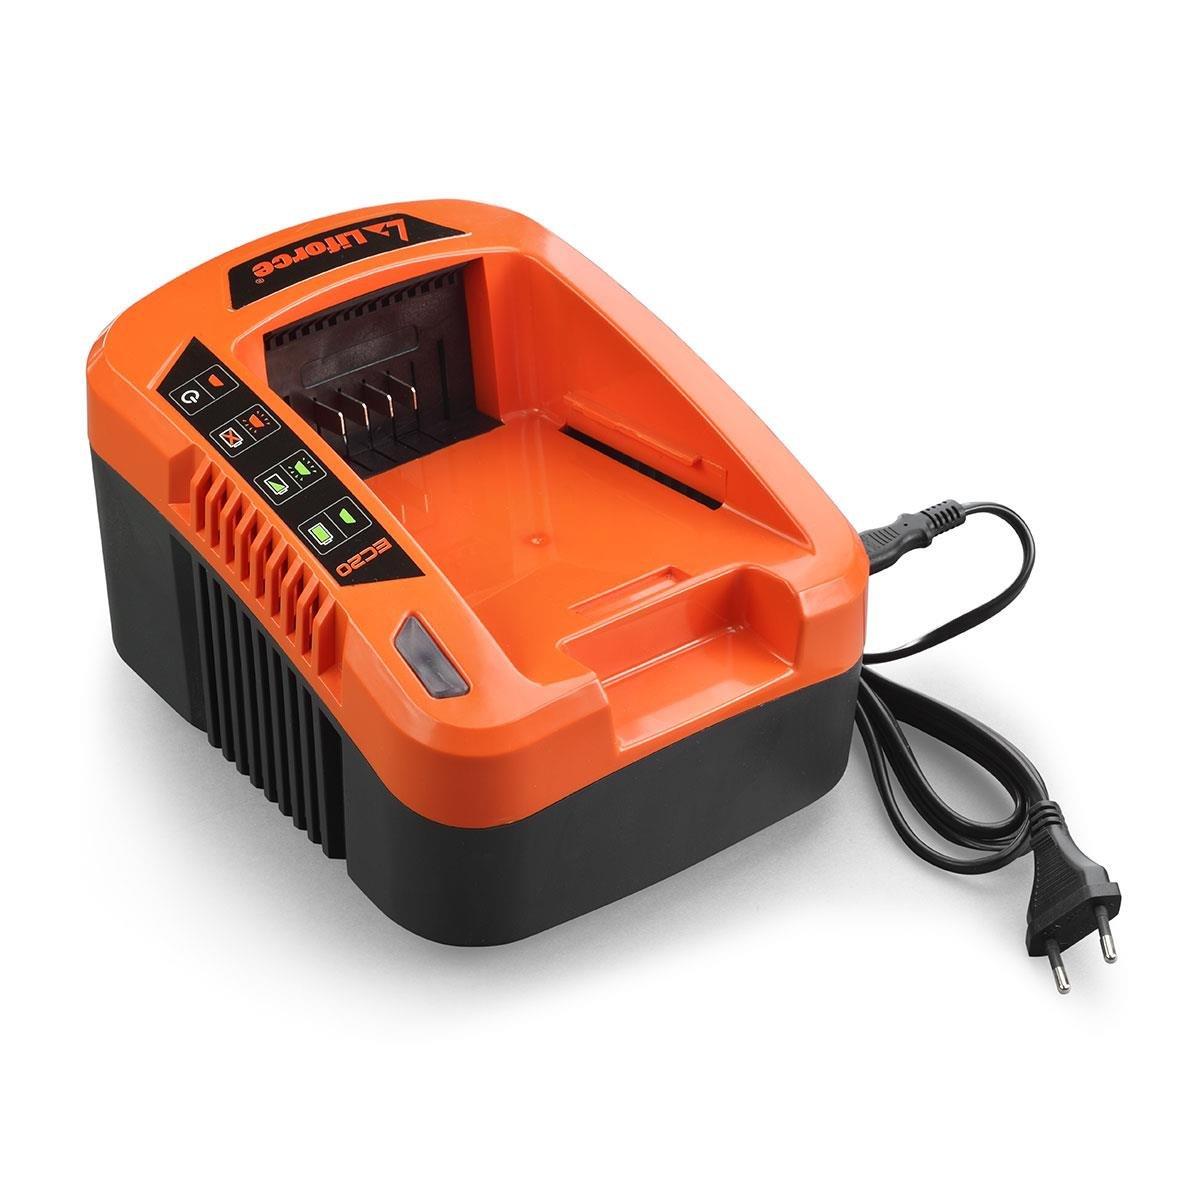 Akku passend f/ür alle FUXTEC 40V Ger/äte Ladestation EC20 Besonderheit FUXTEC 40V Akku Laubbl/äser Set mit Samsung Lithium Akku Batterie 4Ah//EP40